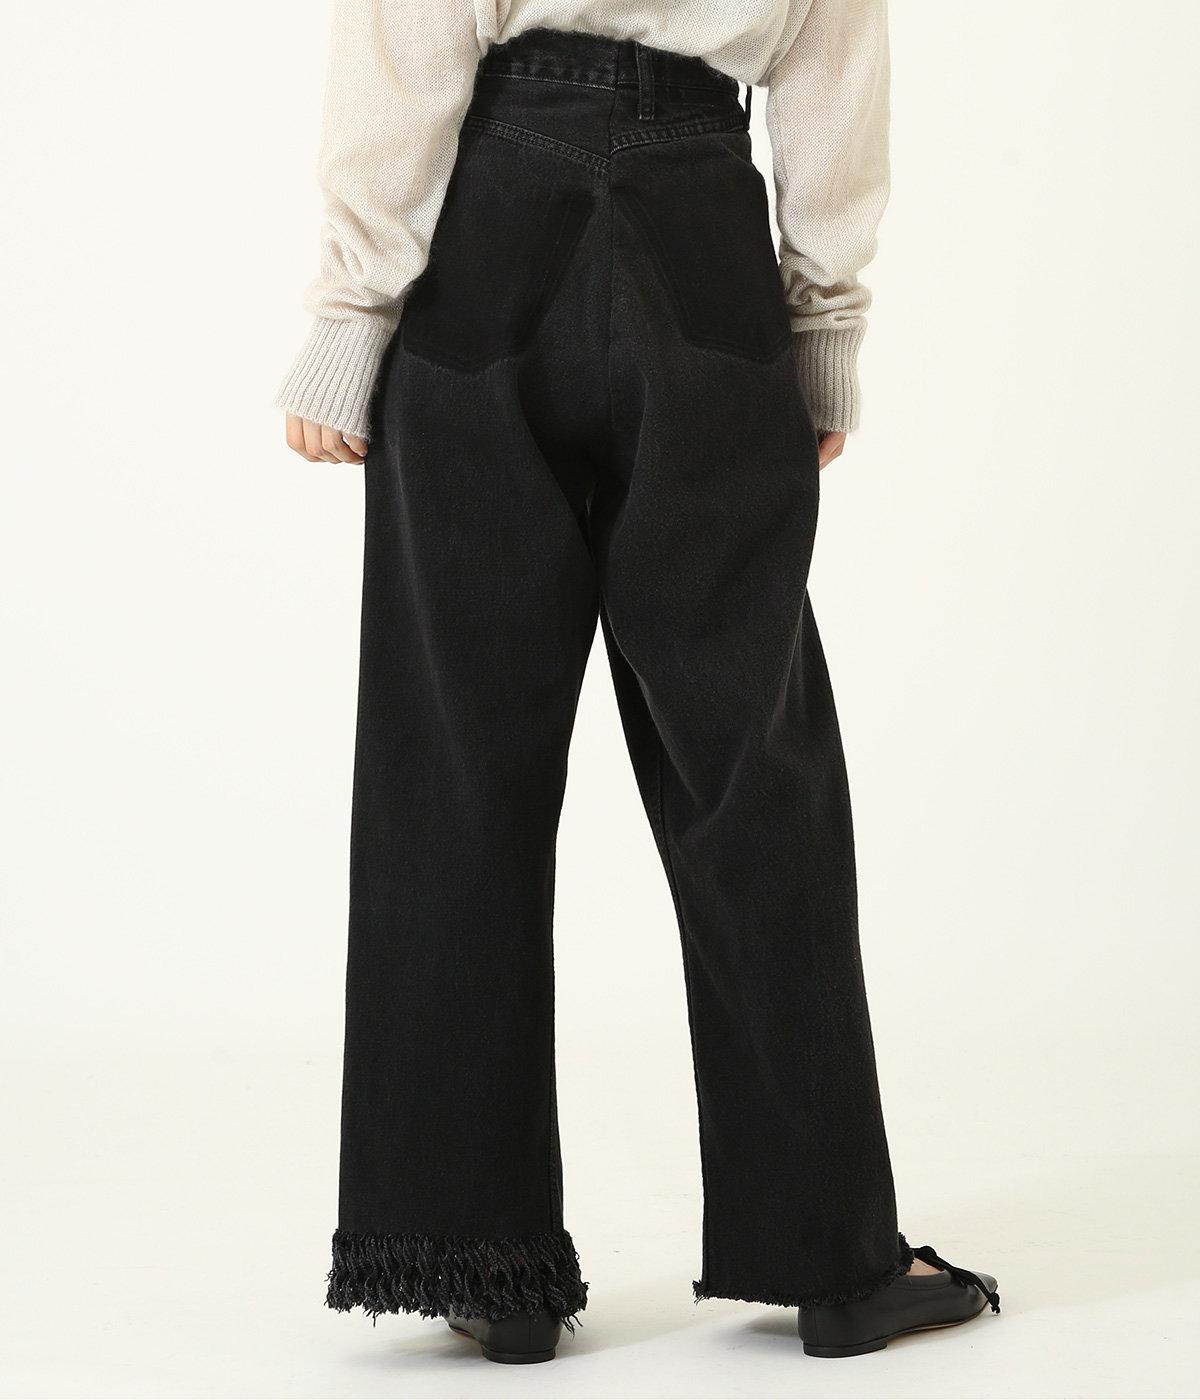 circa make fringe denim pants